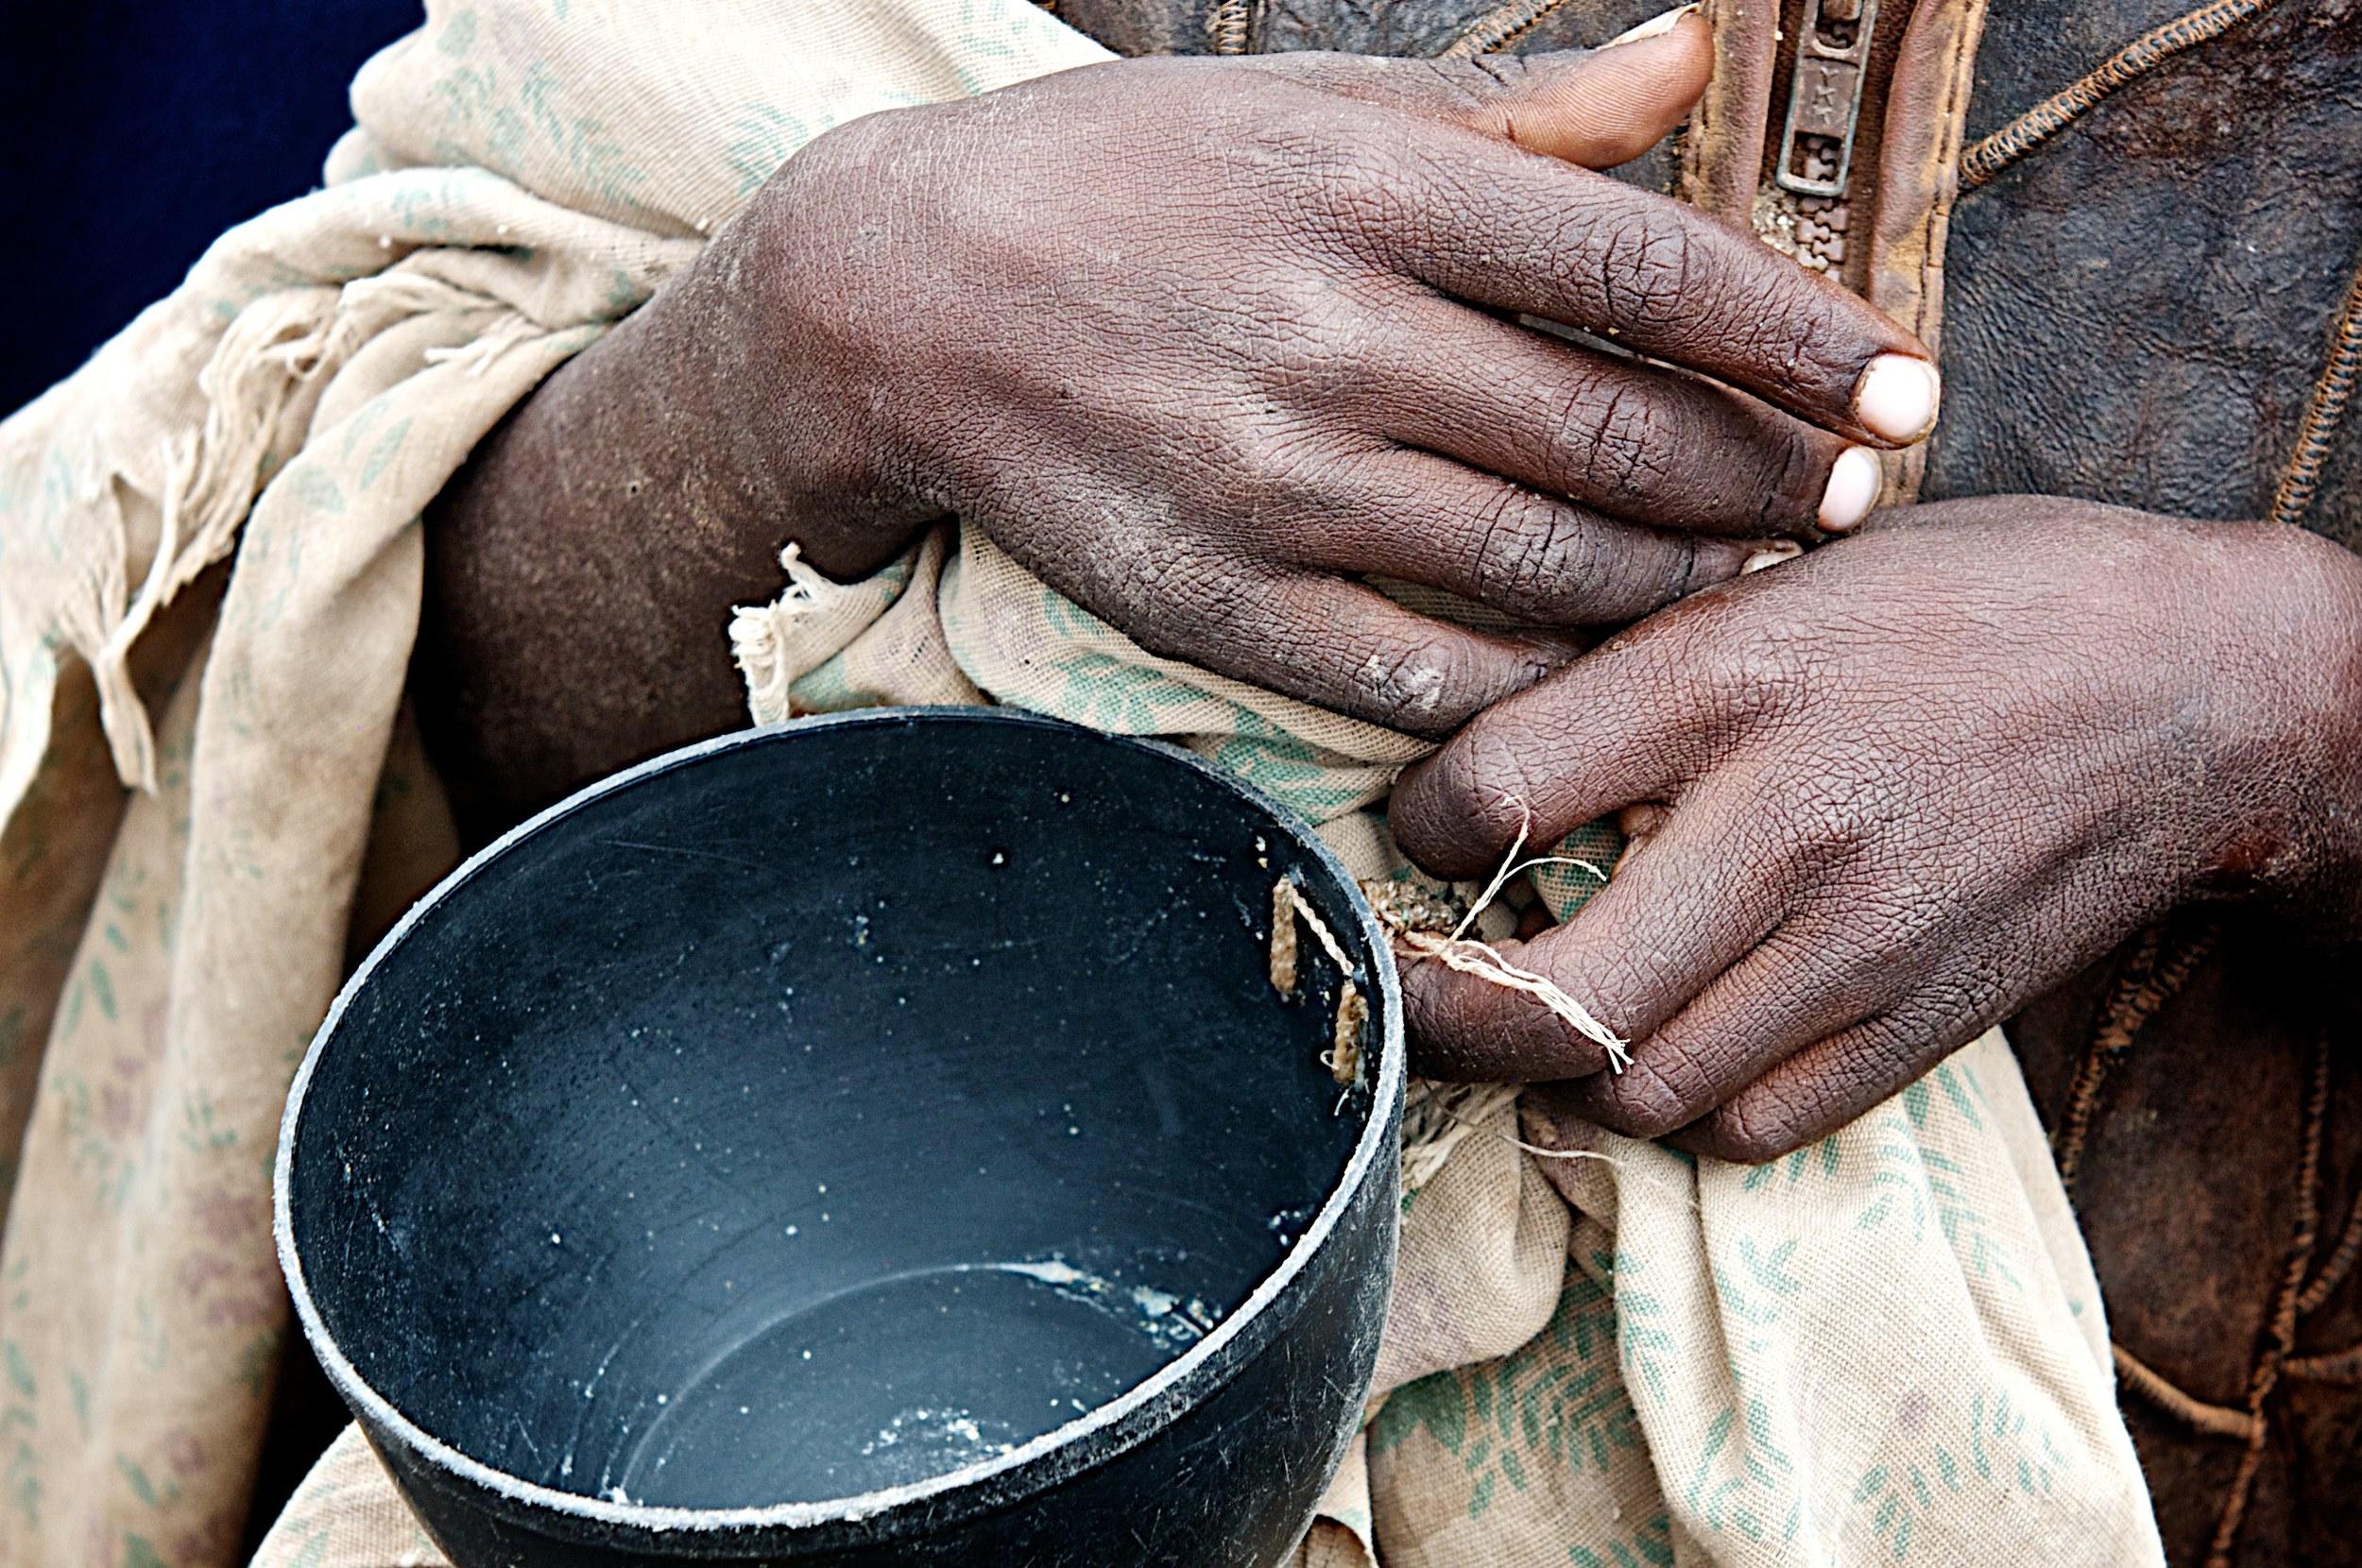 AE_Turkana_0911_0468.jpg